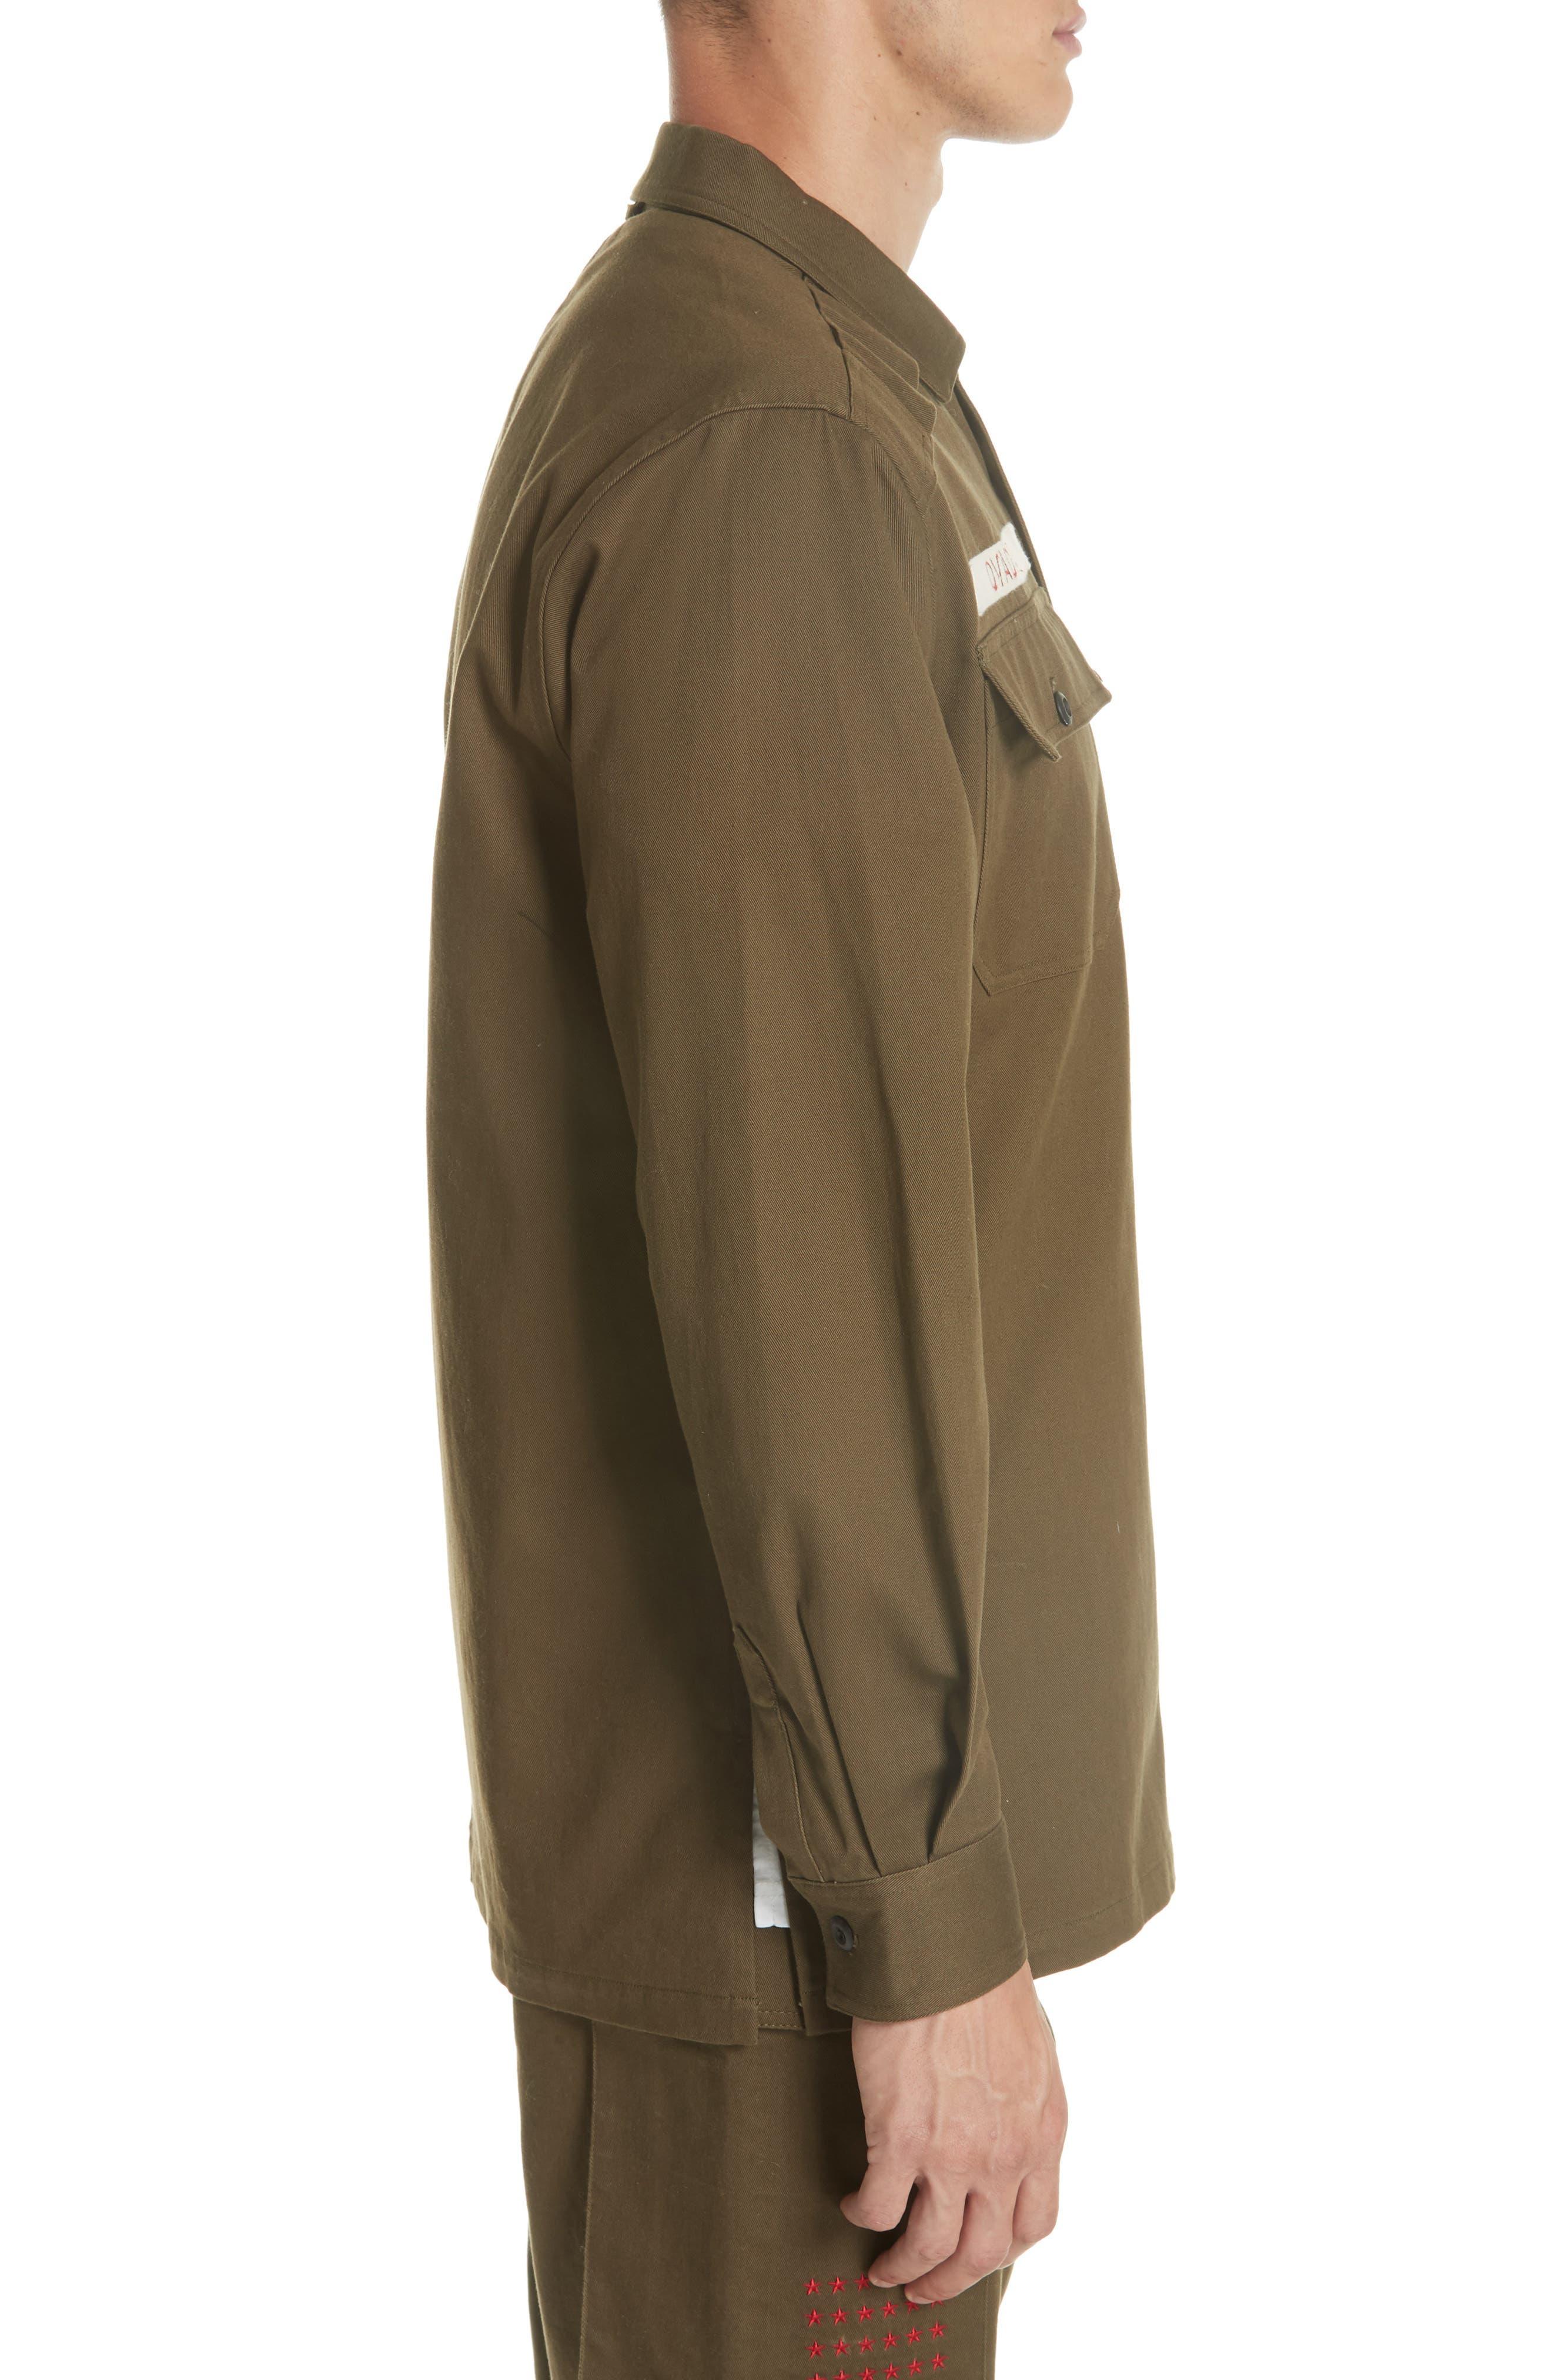 OVADIA & SONS,                             Military Woven Shirt,                             Alternate thumbnail 3, color,                             325